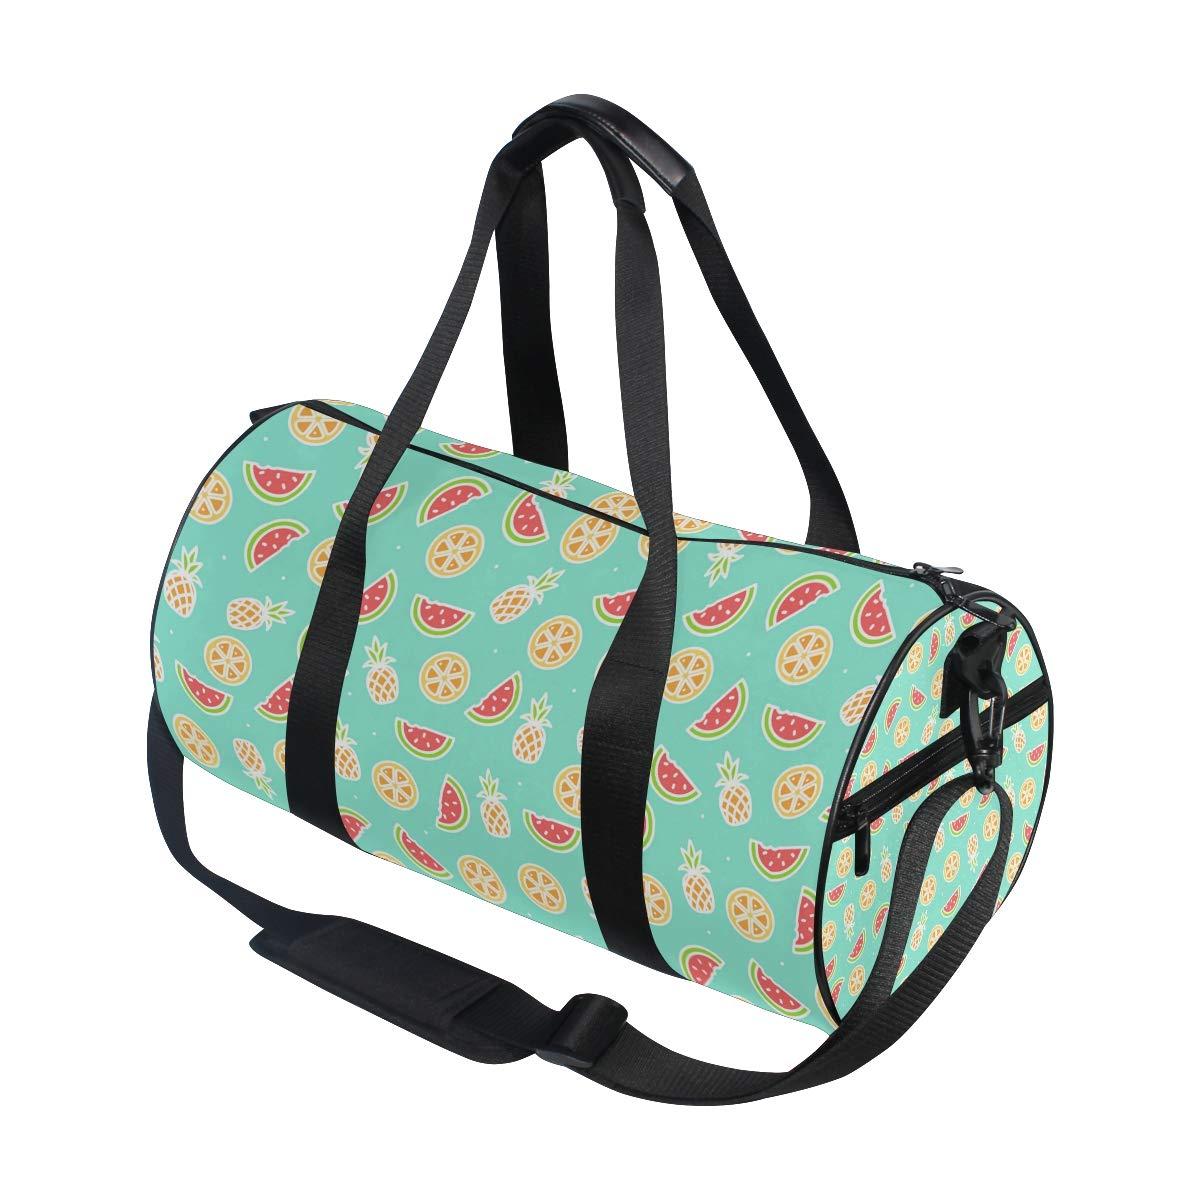 Waterproof Non-Slip Wearable Crossbody Bag fitness bag Shoulder Bag Handheld Vegetable Picture